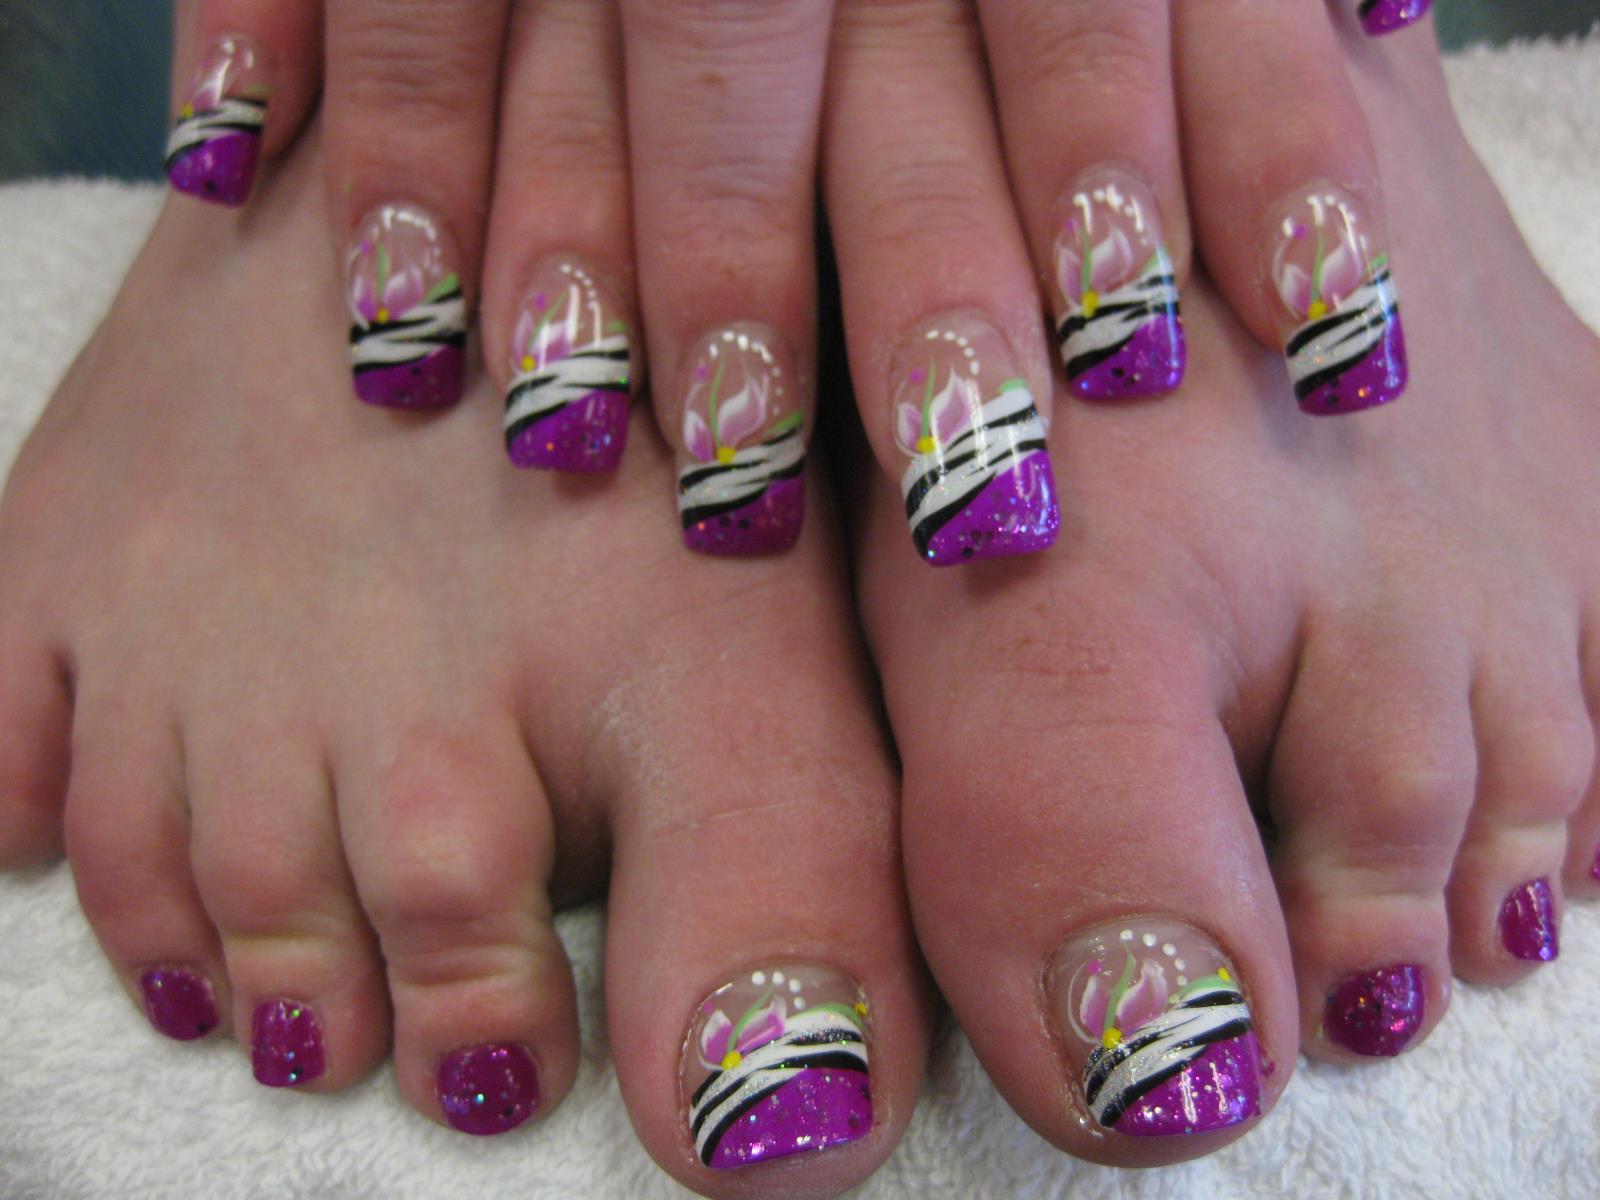 African Mardi Gras Nail Art Design By Top Nails Clarksville Tn